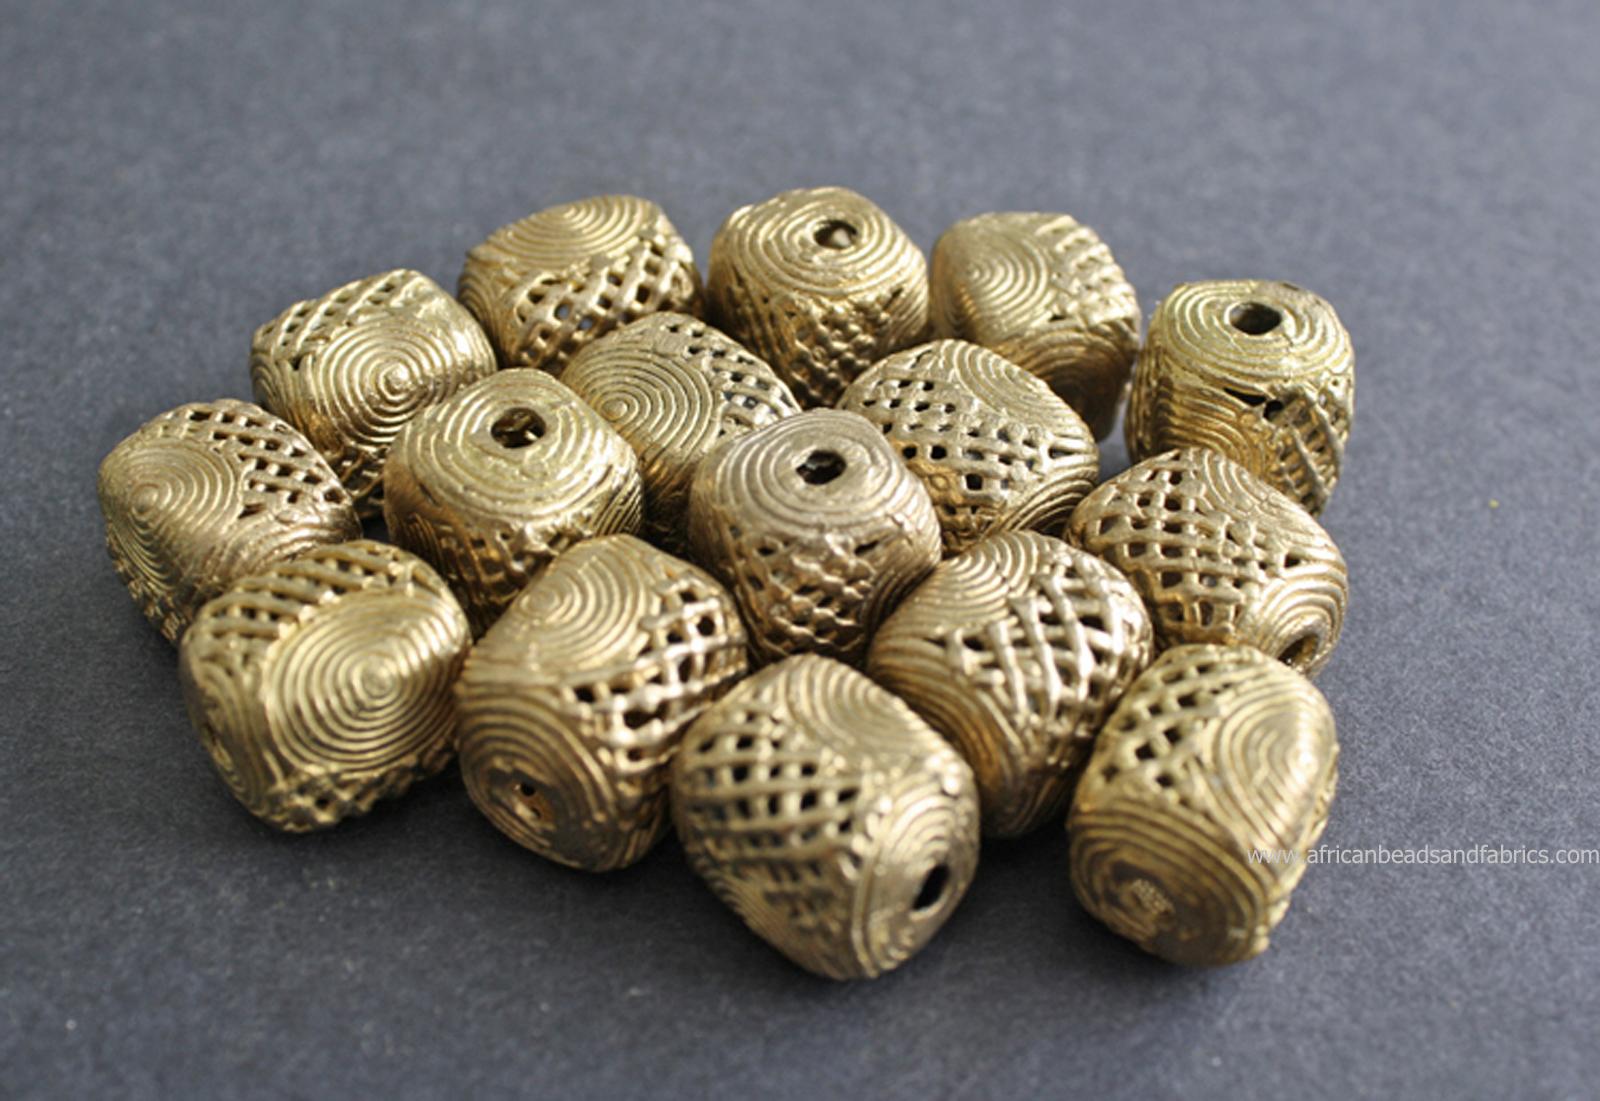 African-brass-Beads-Ghana-Ashanti-Lost-Wax-Cuboid-20mm-watermarked